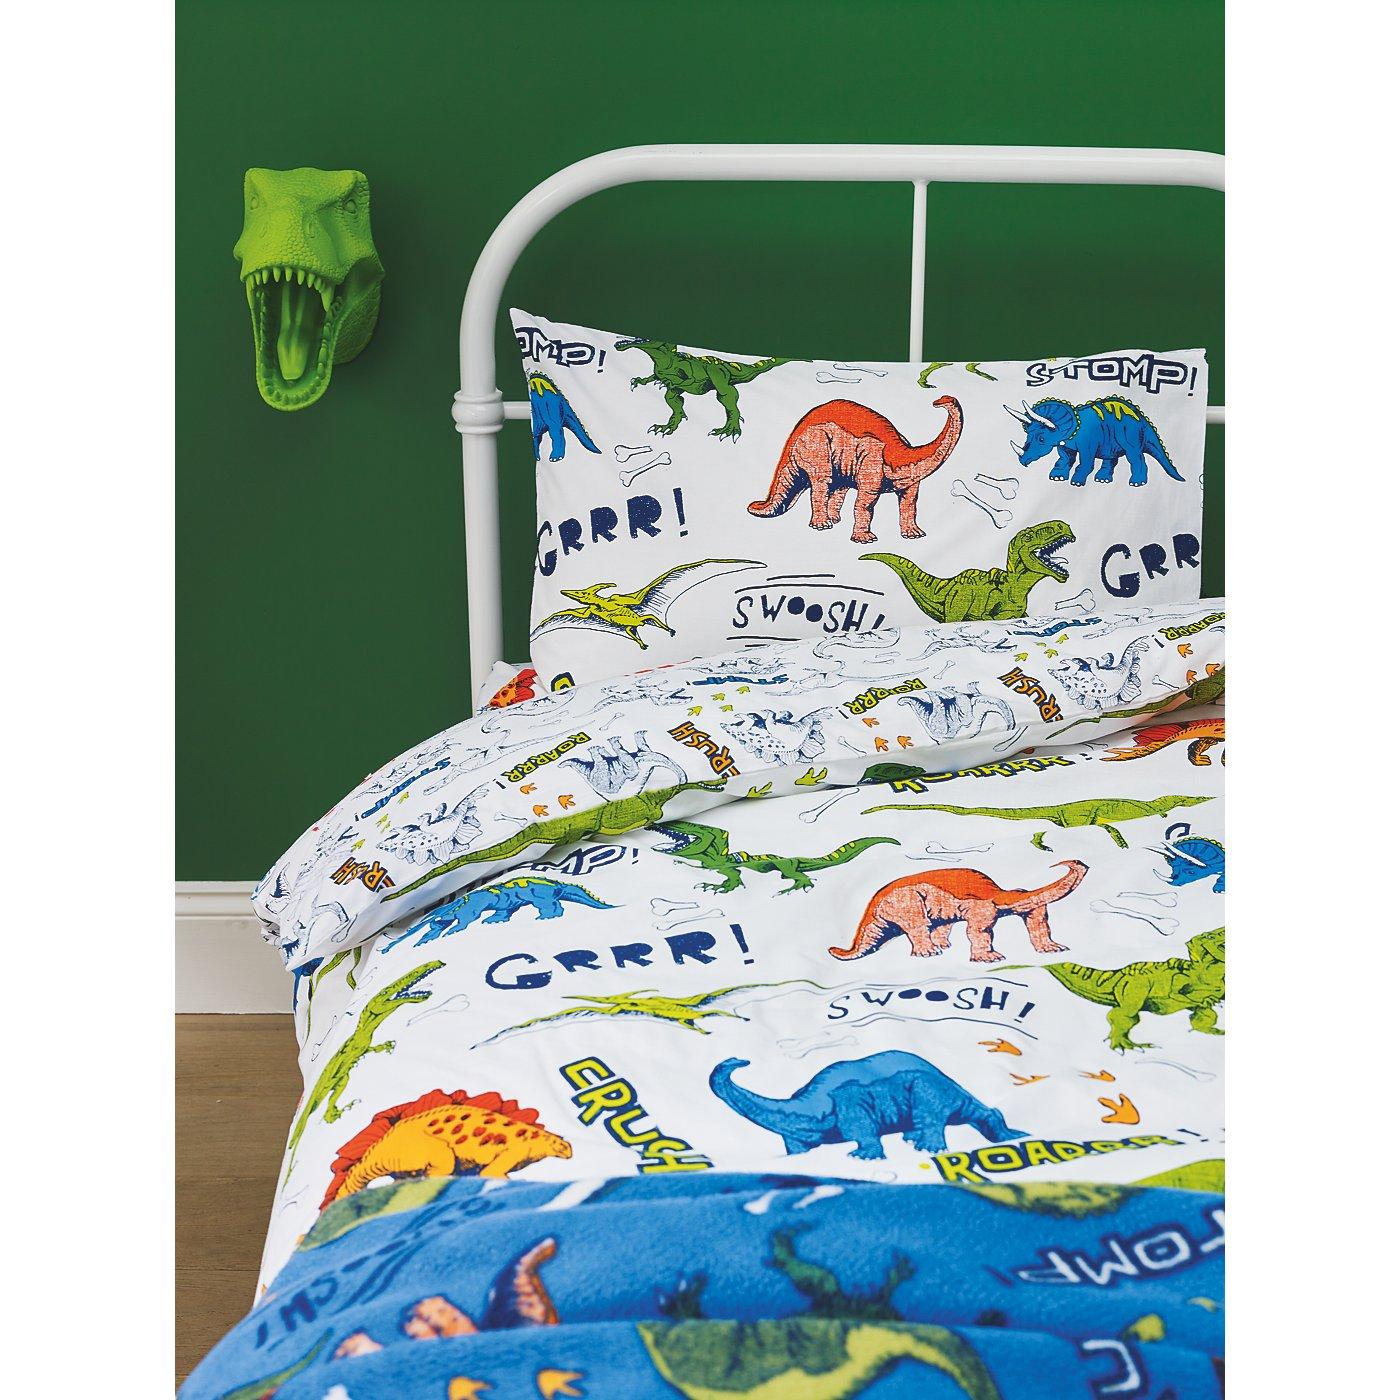 dinosaur bedroom. Dinosaur Bedroom Range  Loading zoom Autumn Catalogue George at ASDA